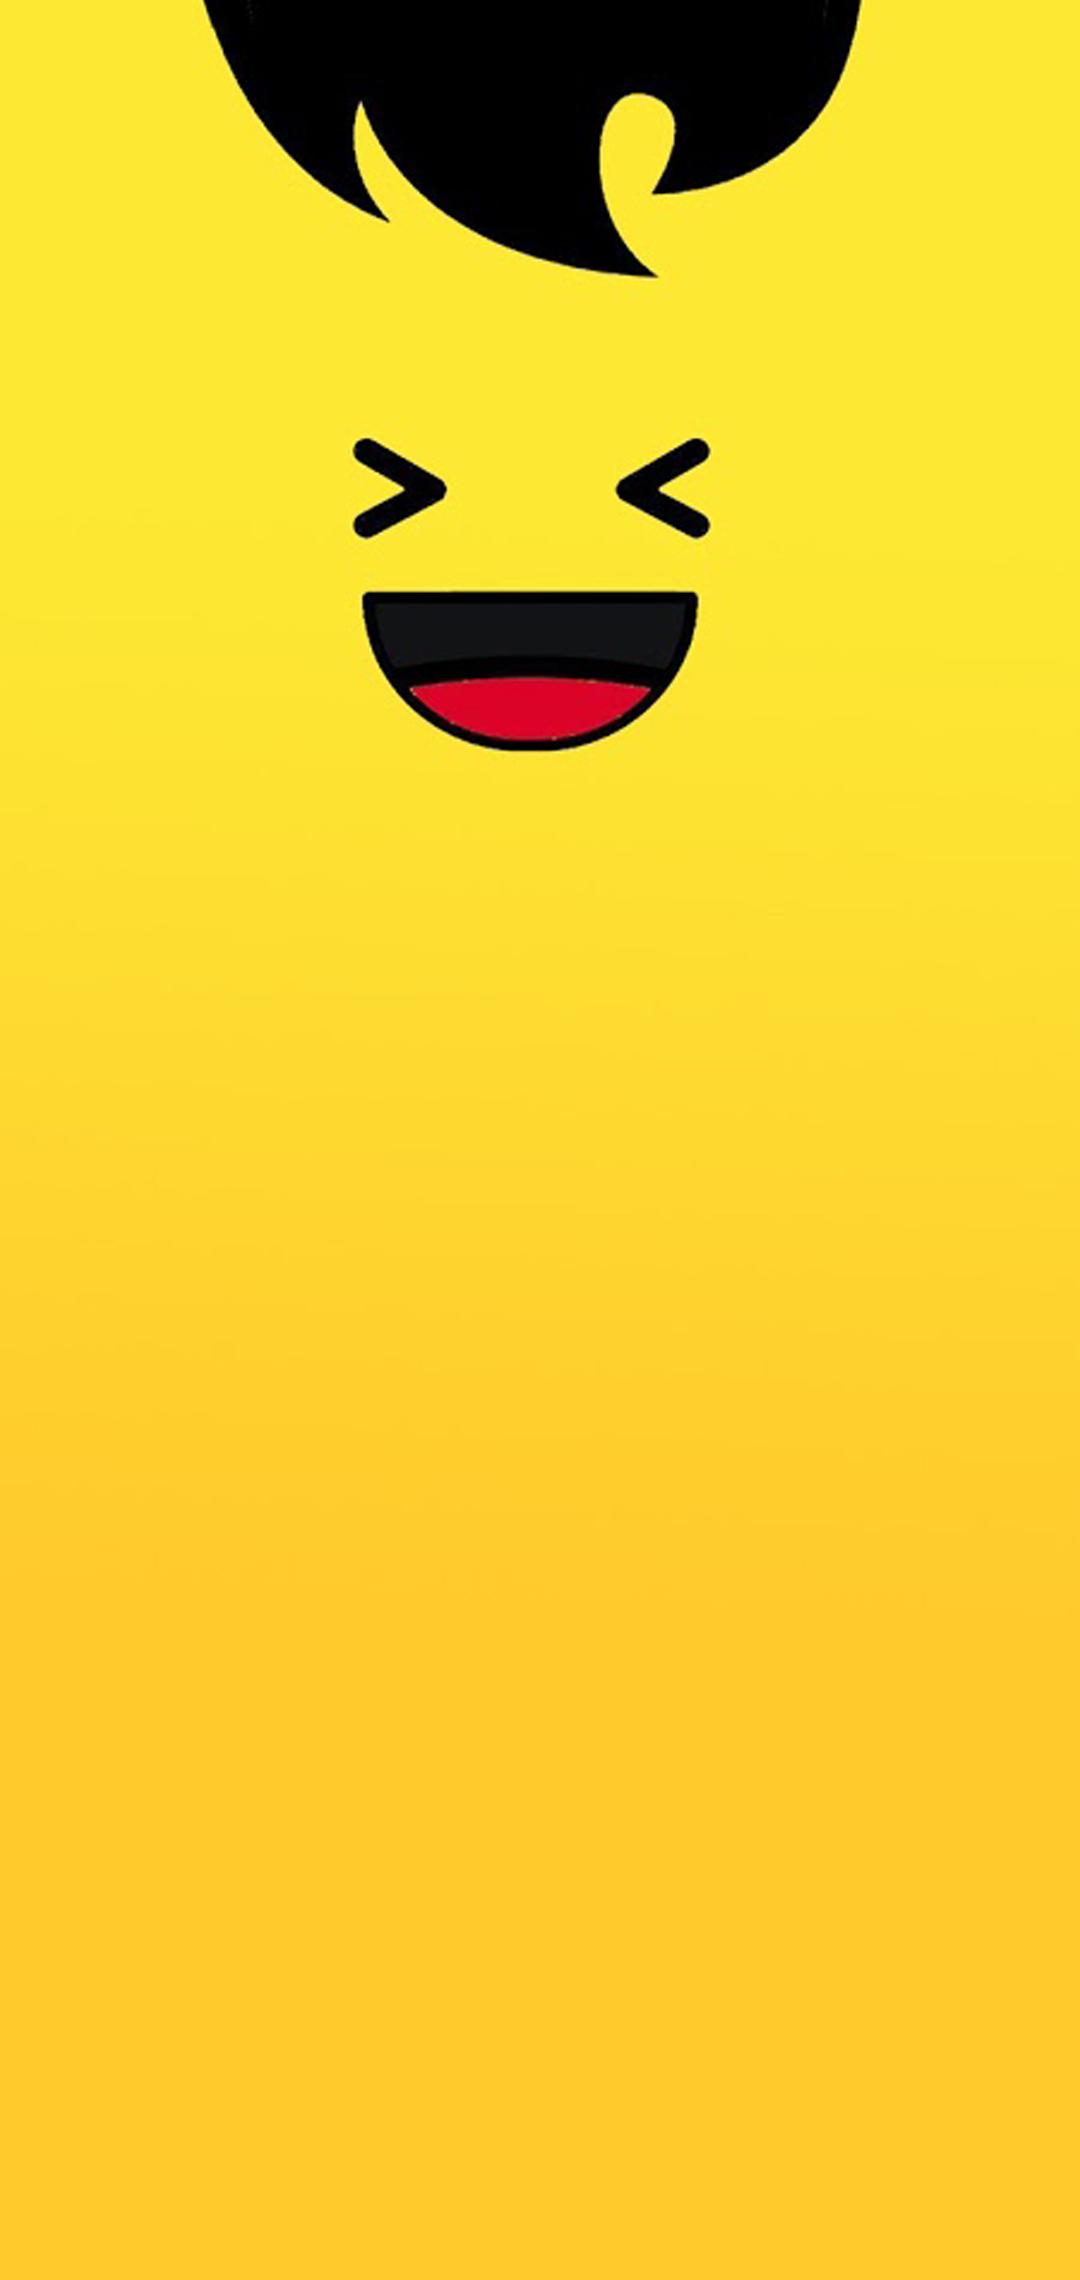 emoji hole-punch wallpaper